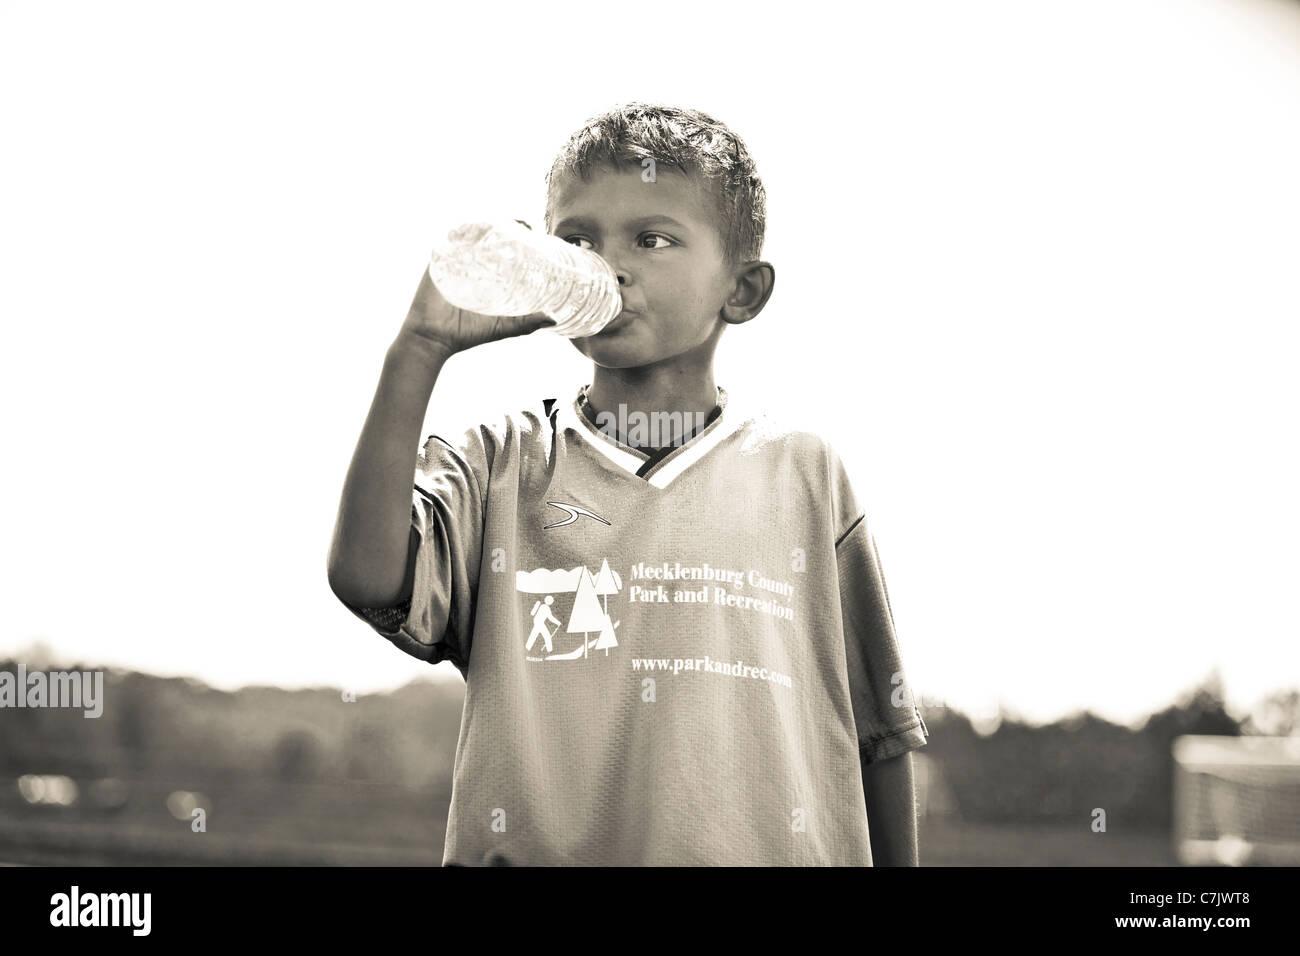 Retrato de niño beber agua embotellada Imagen De Stock